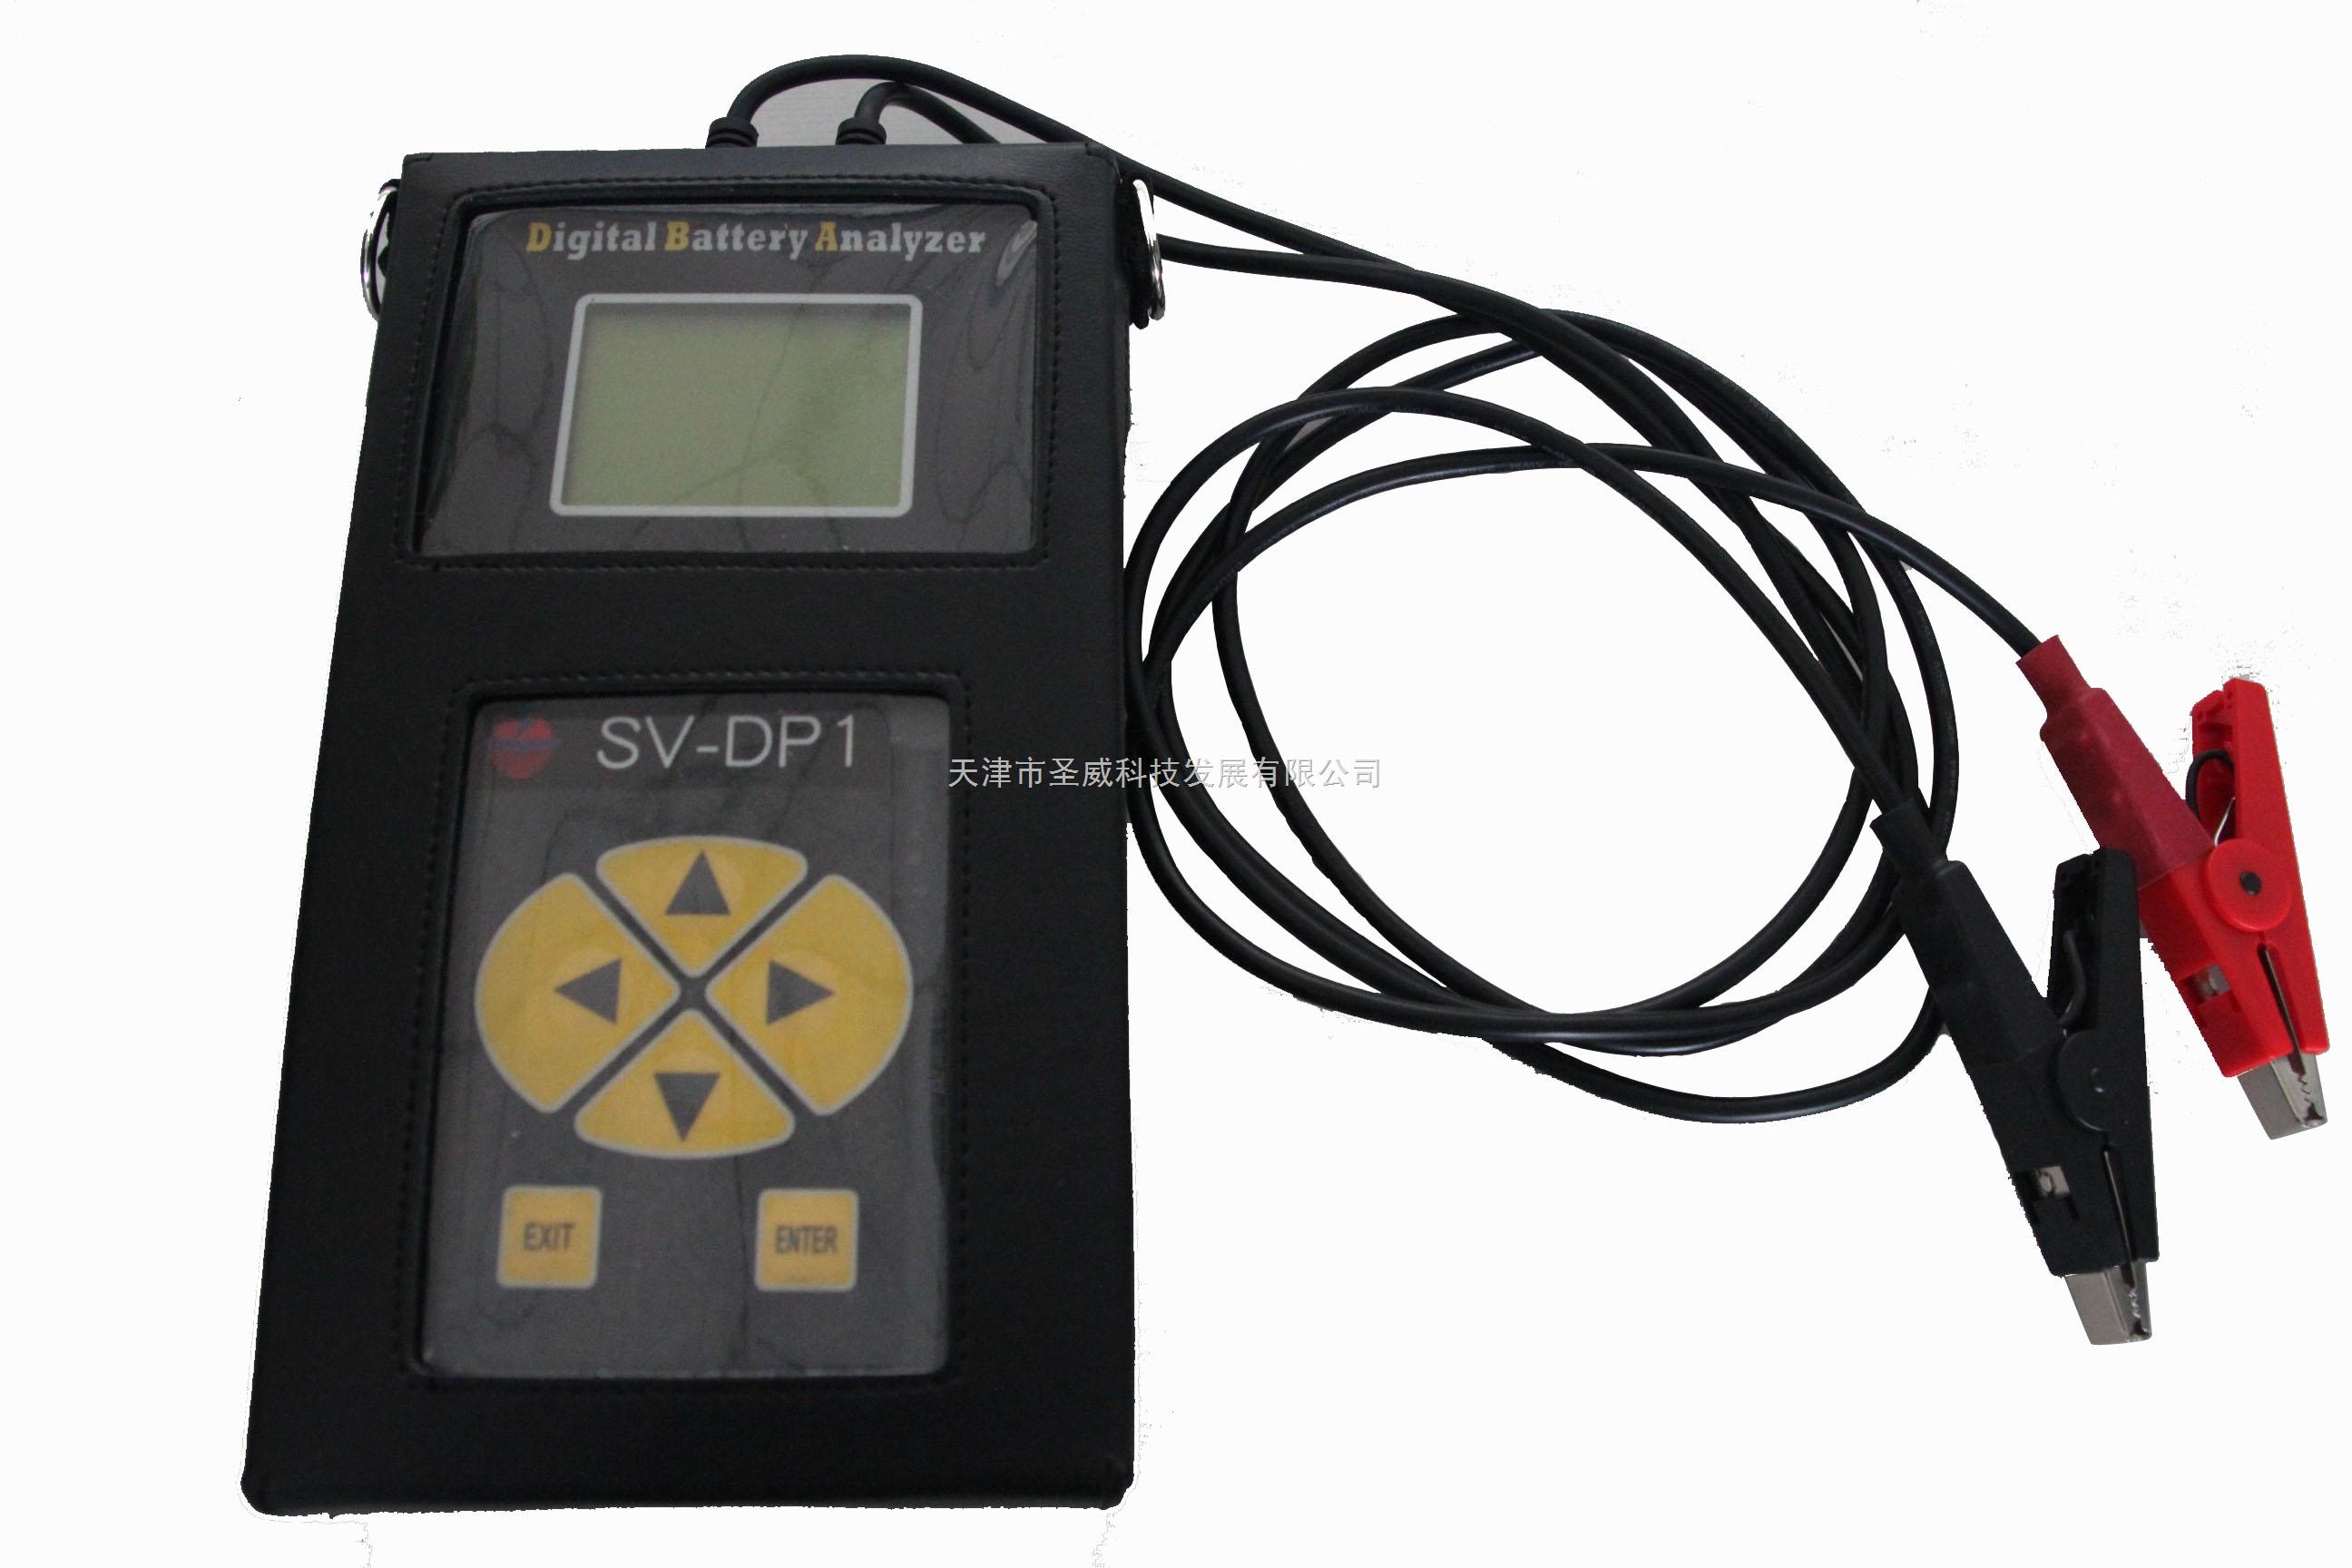 sv-dp1 智能电瓶检测仪